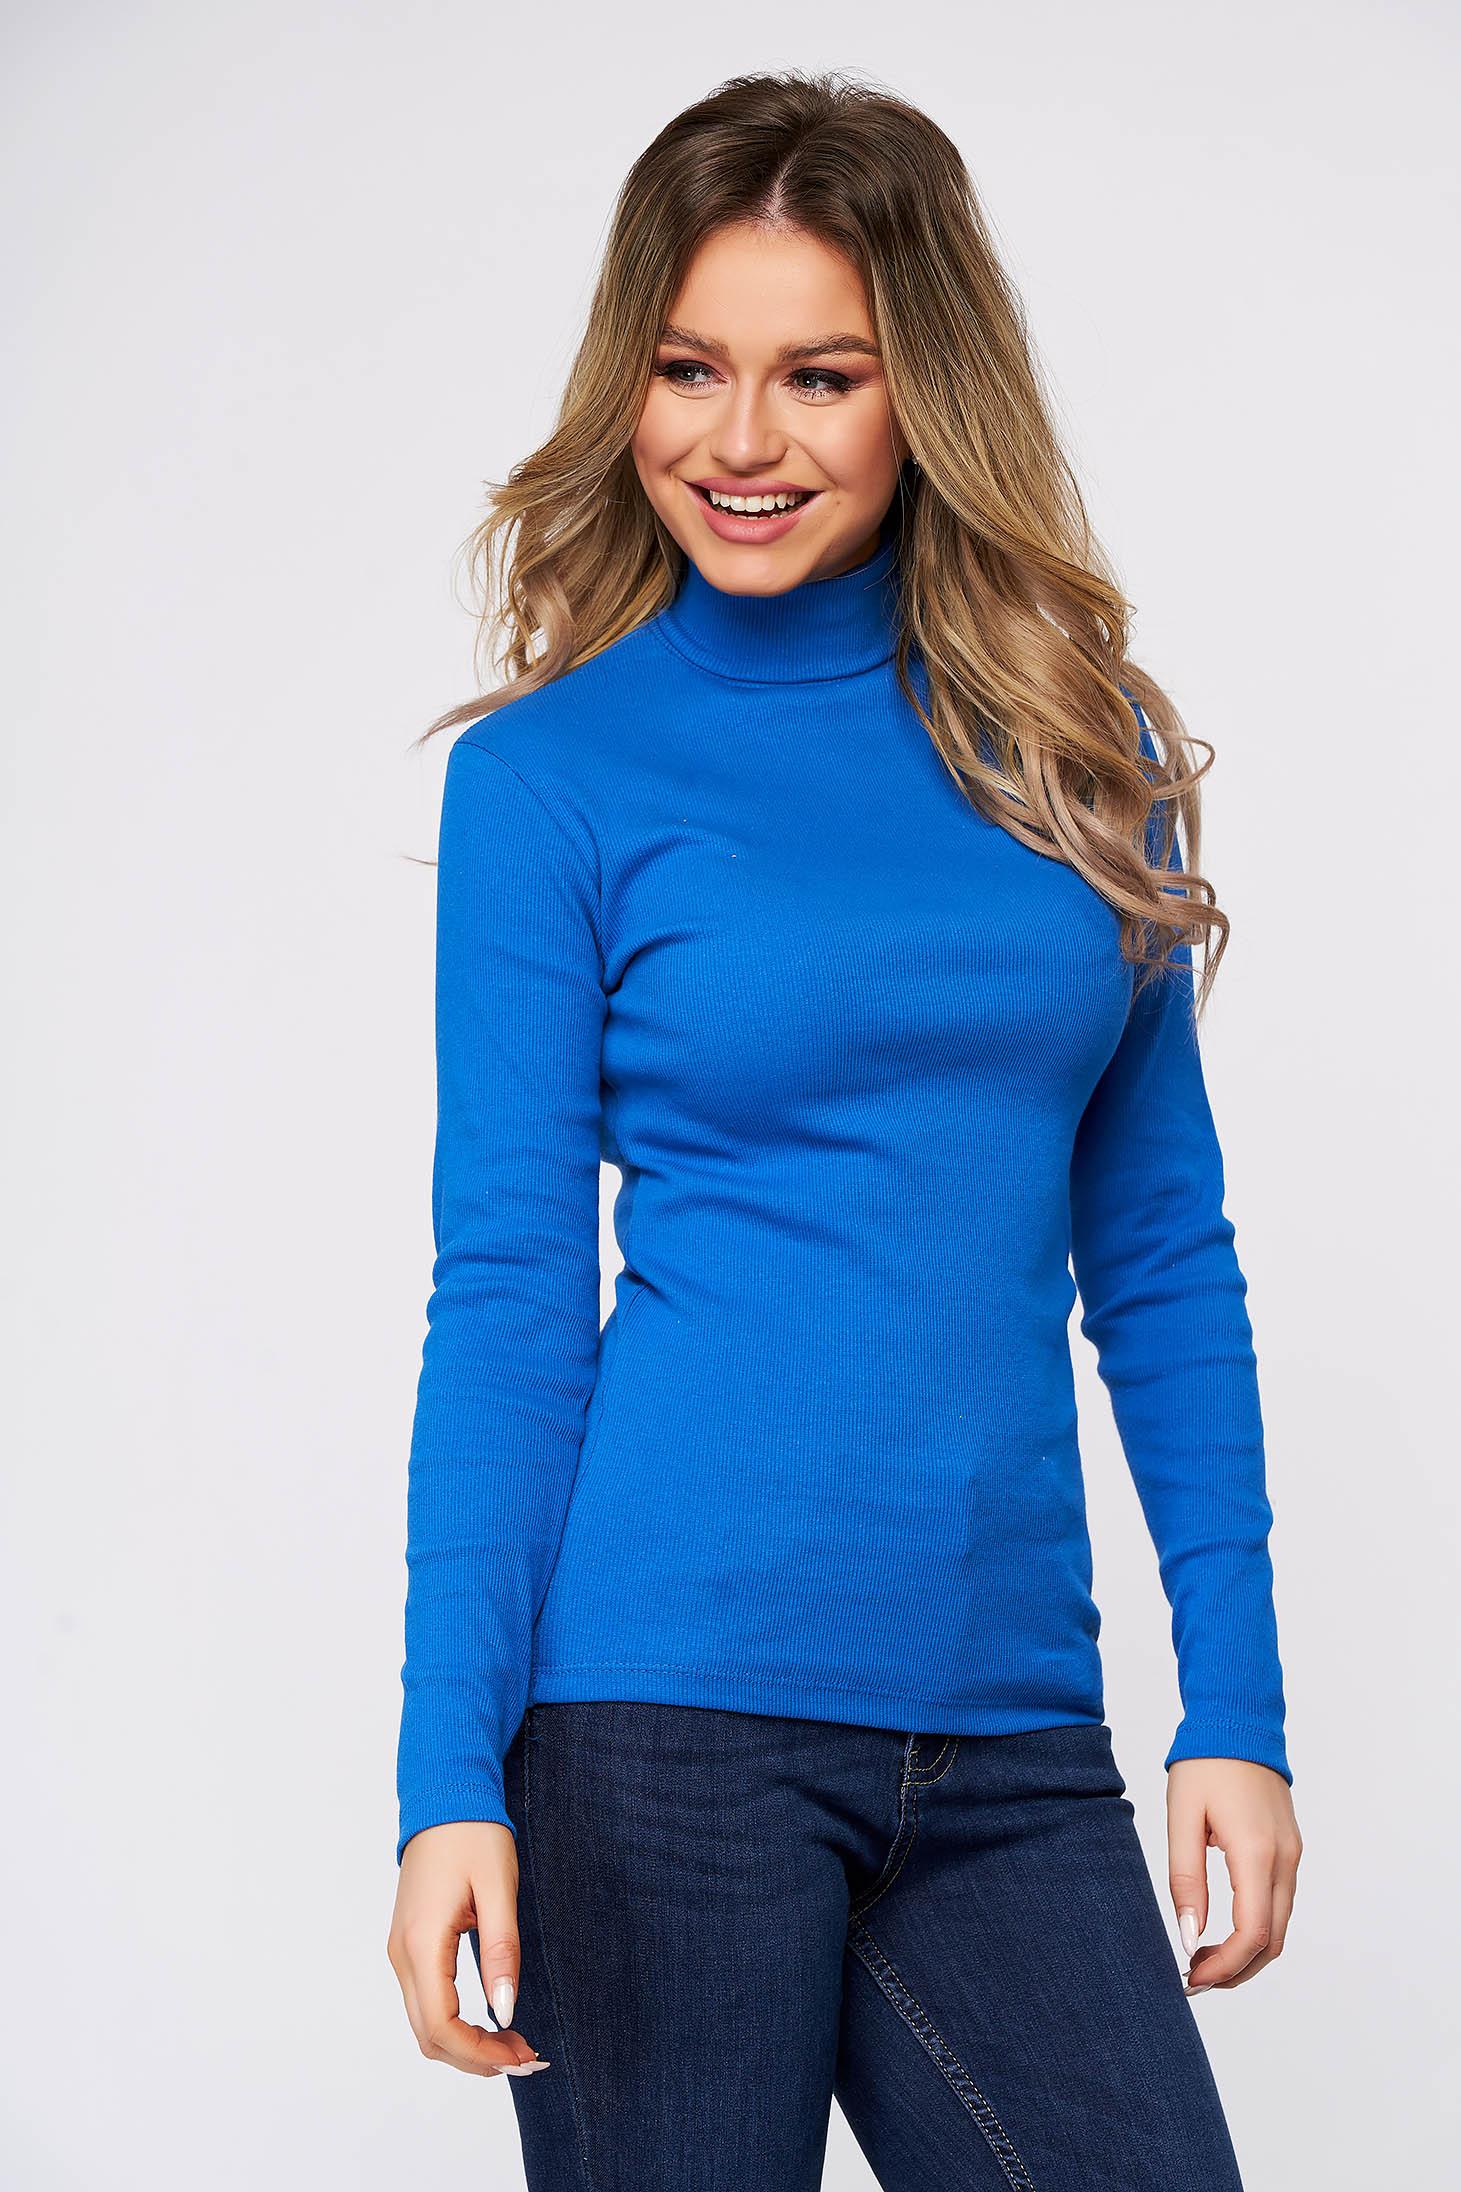 Bluza dama SunShine albastra din bumbac elastic reiat pe gat cu un croi mulat